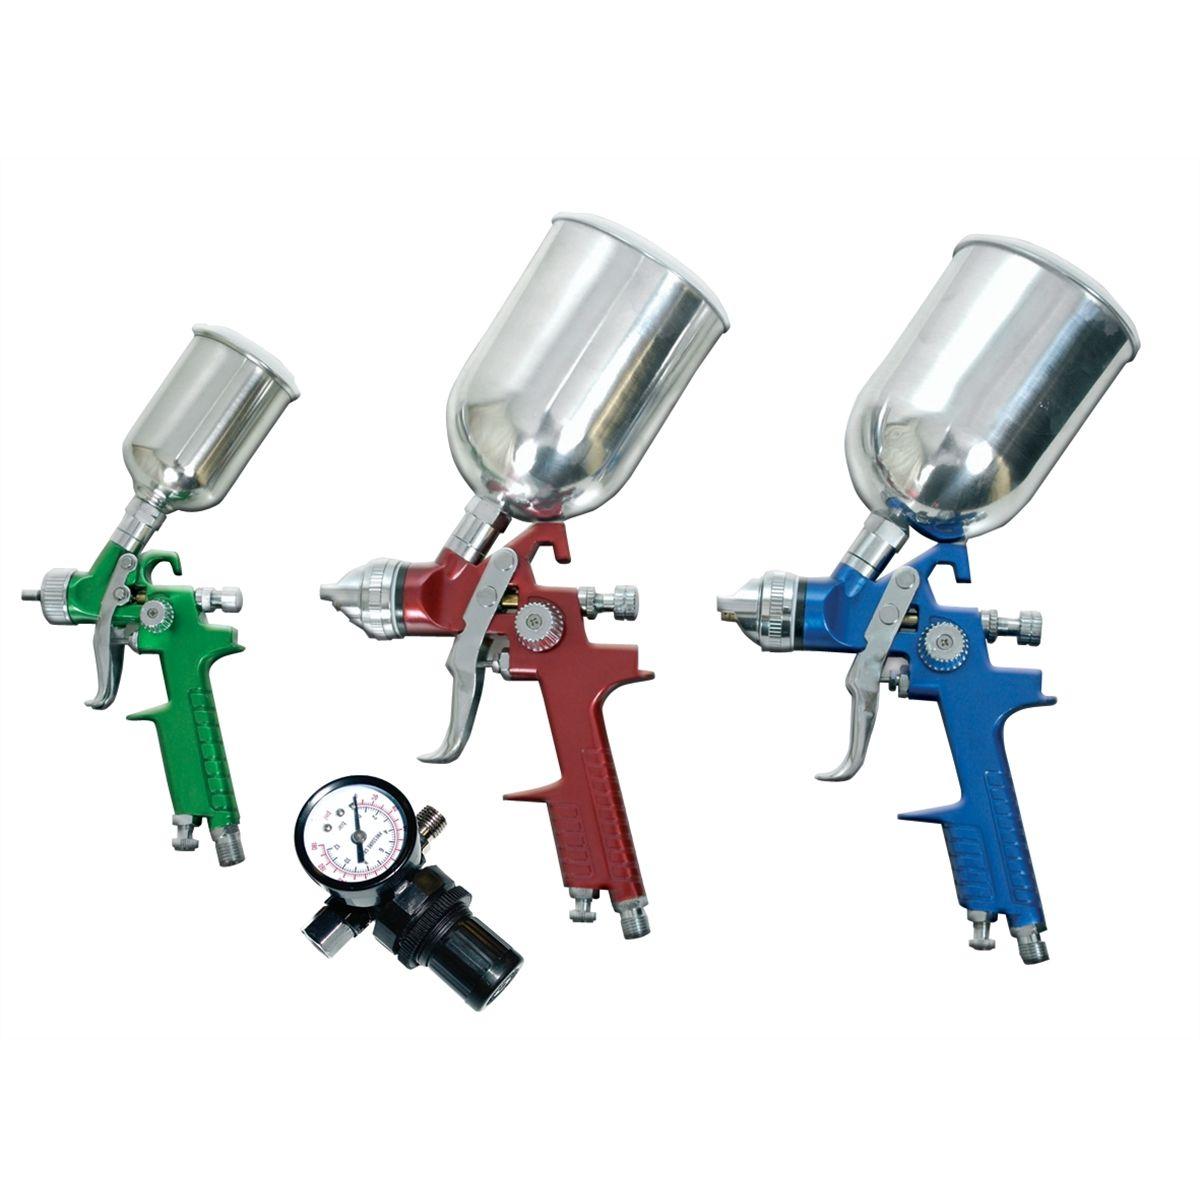 Hvlp Spray Gun Kit >> 4 Piece Waterborne H V L P Spray Gun Kit